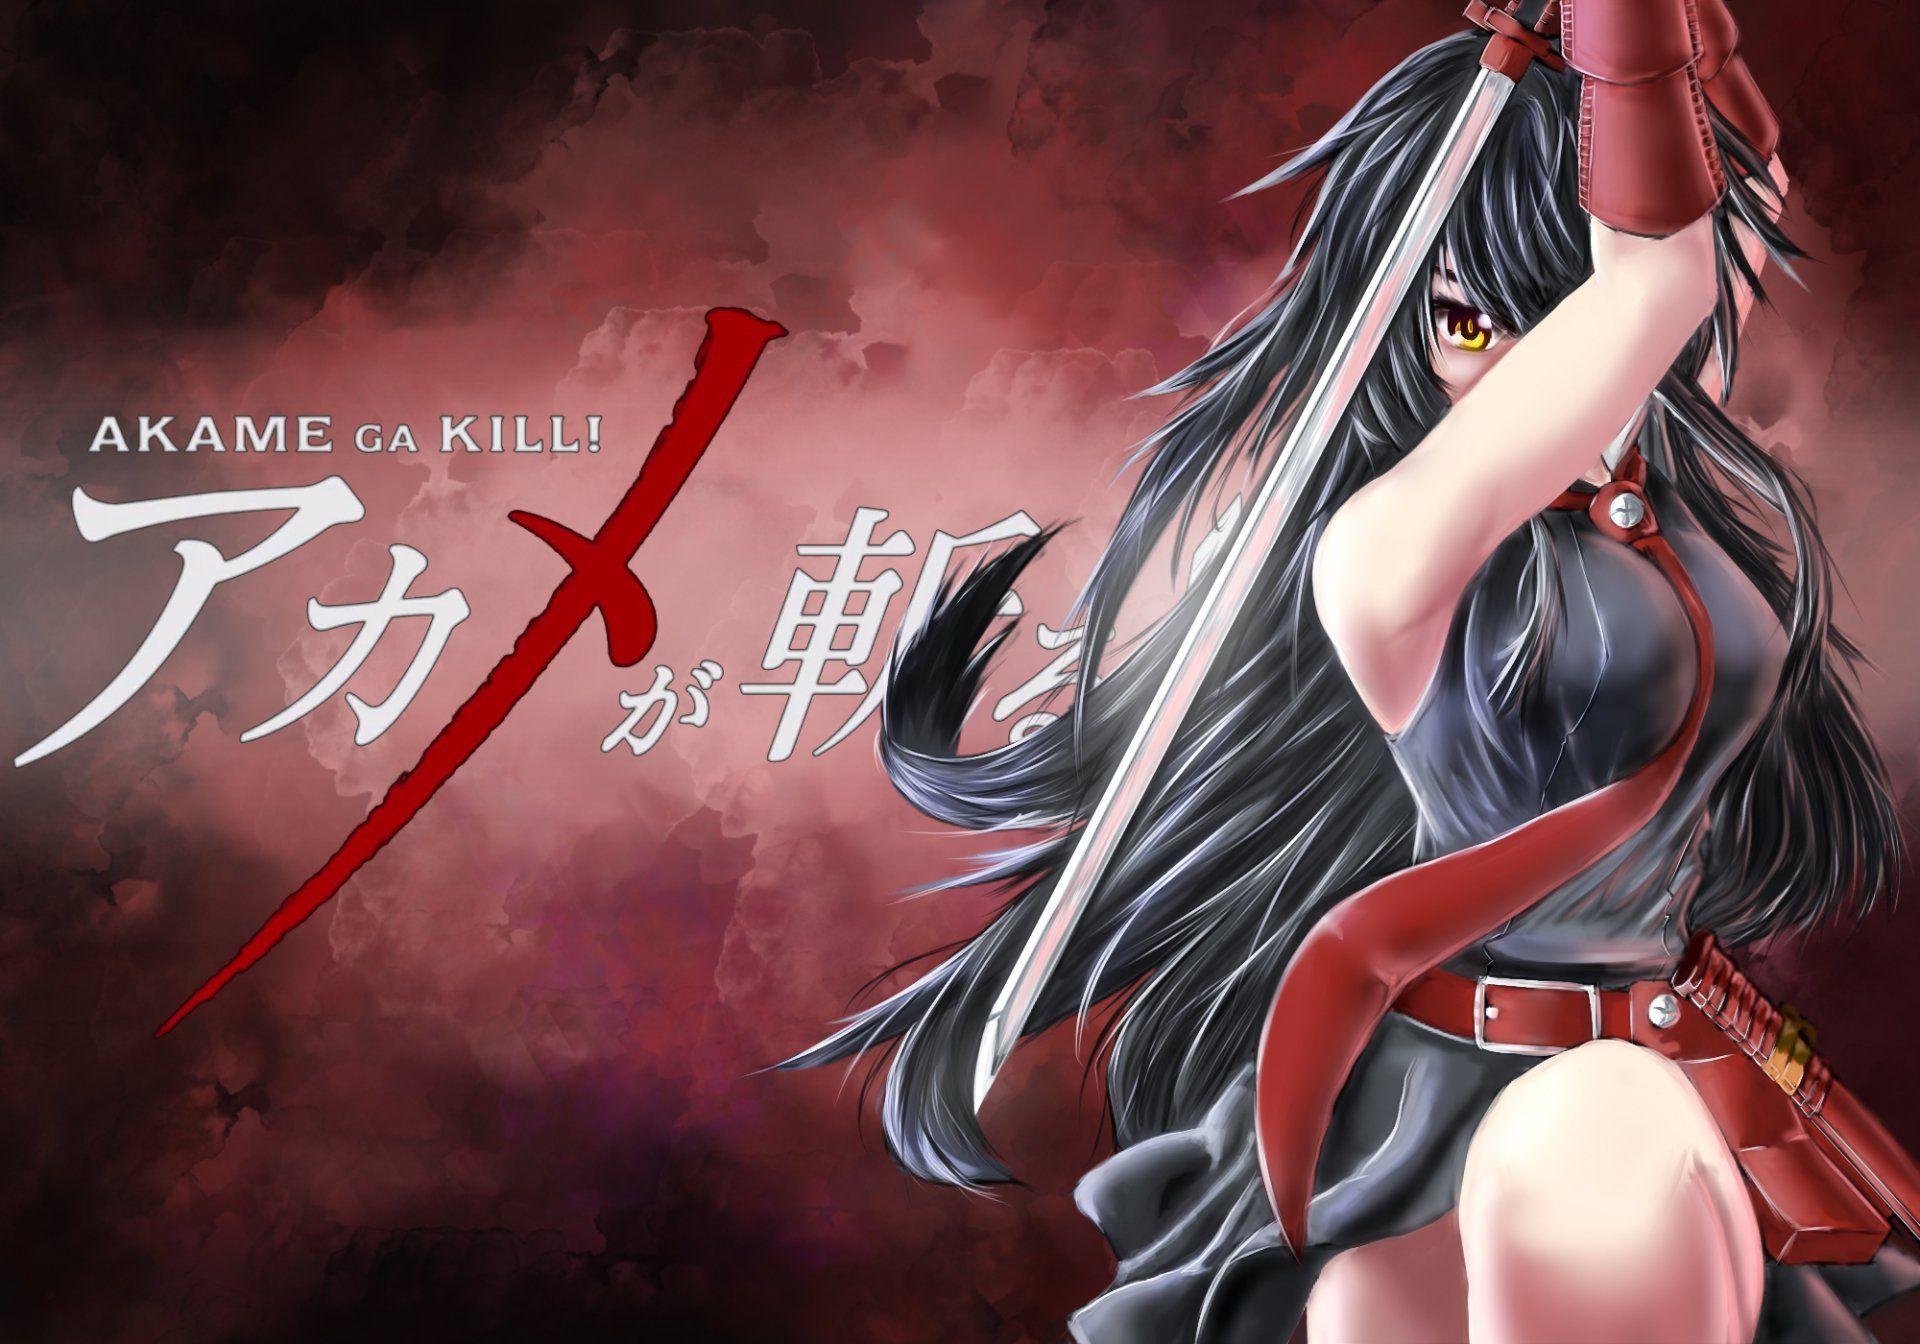 Anime Akame Ga Kill Akame Akame Ga Kill Wallpaper Akame Ga